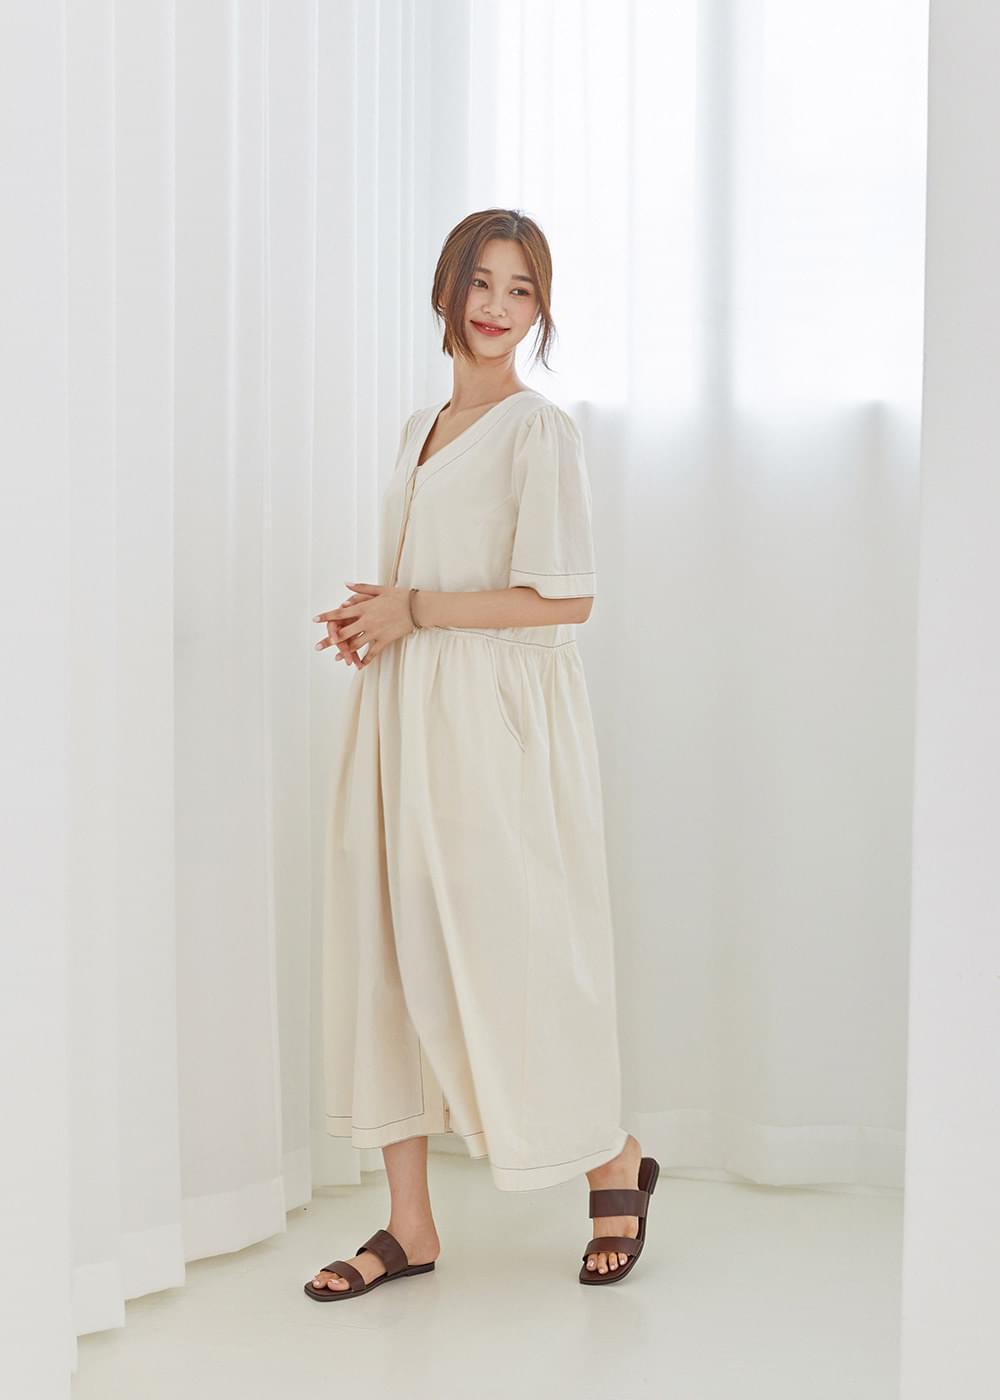 Roaming short sleeve dress